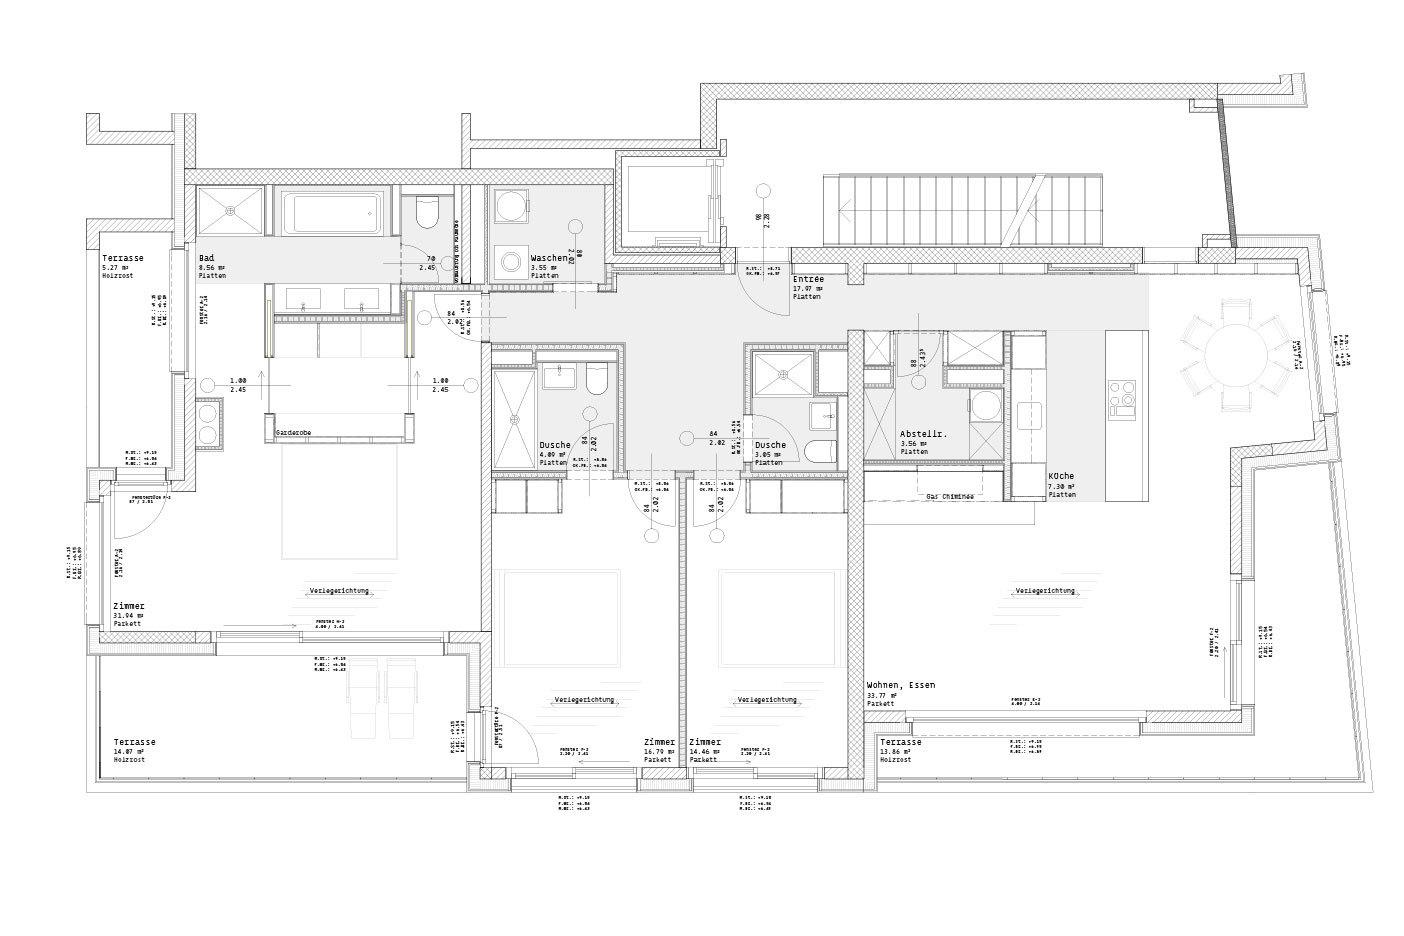 Engelberg C1 1 50 Grundriss 151216 Porfolio